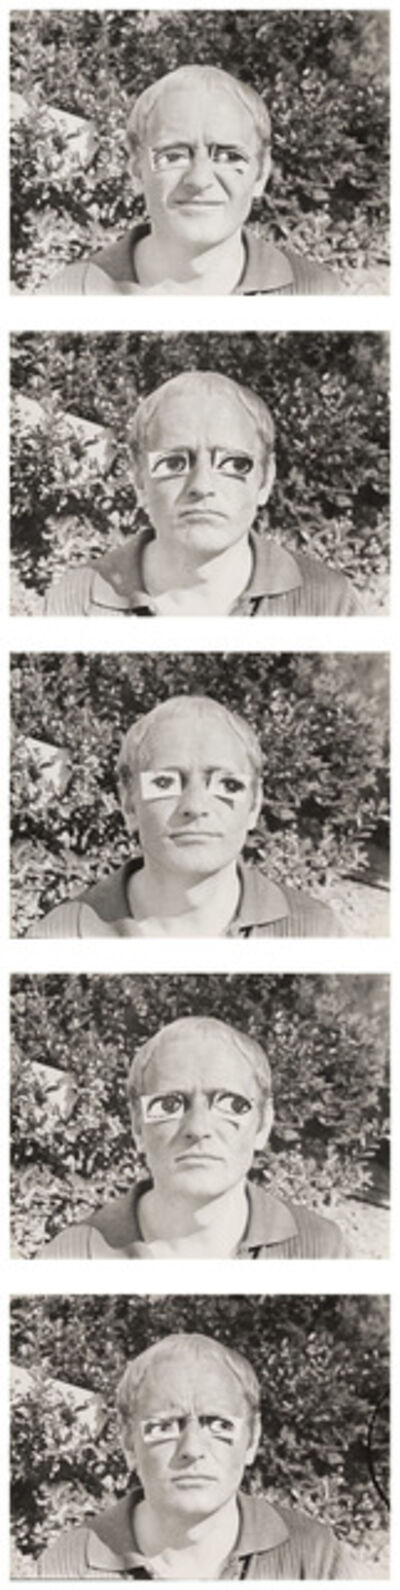 Károly Kismányoky, 'With the Eyes of Others I - IV', 1973